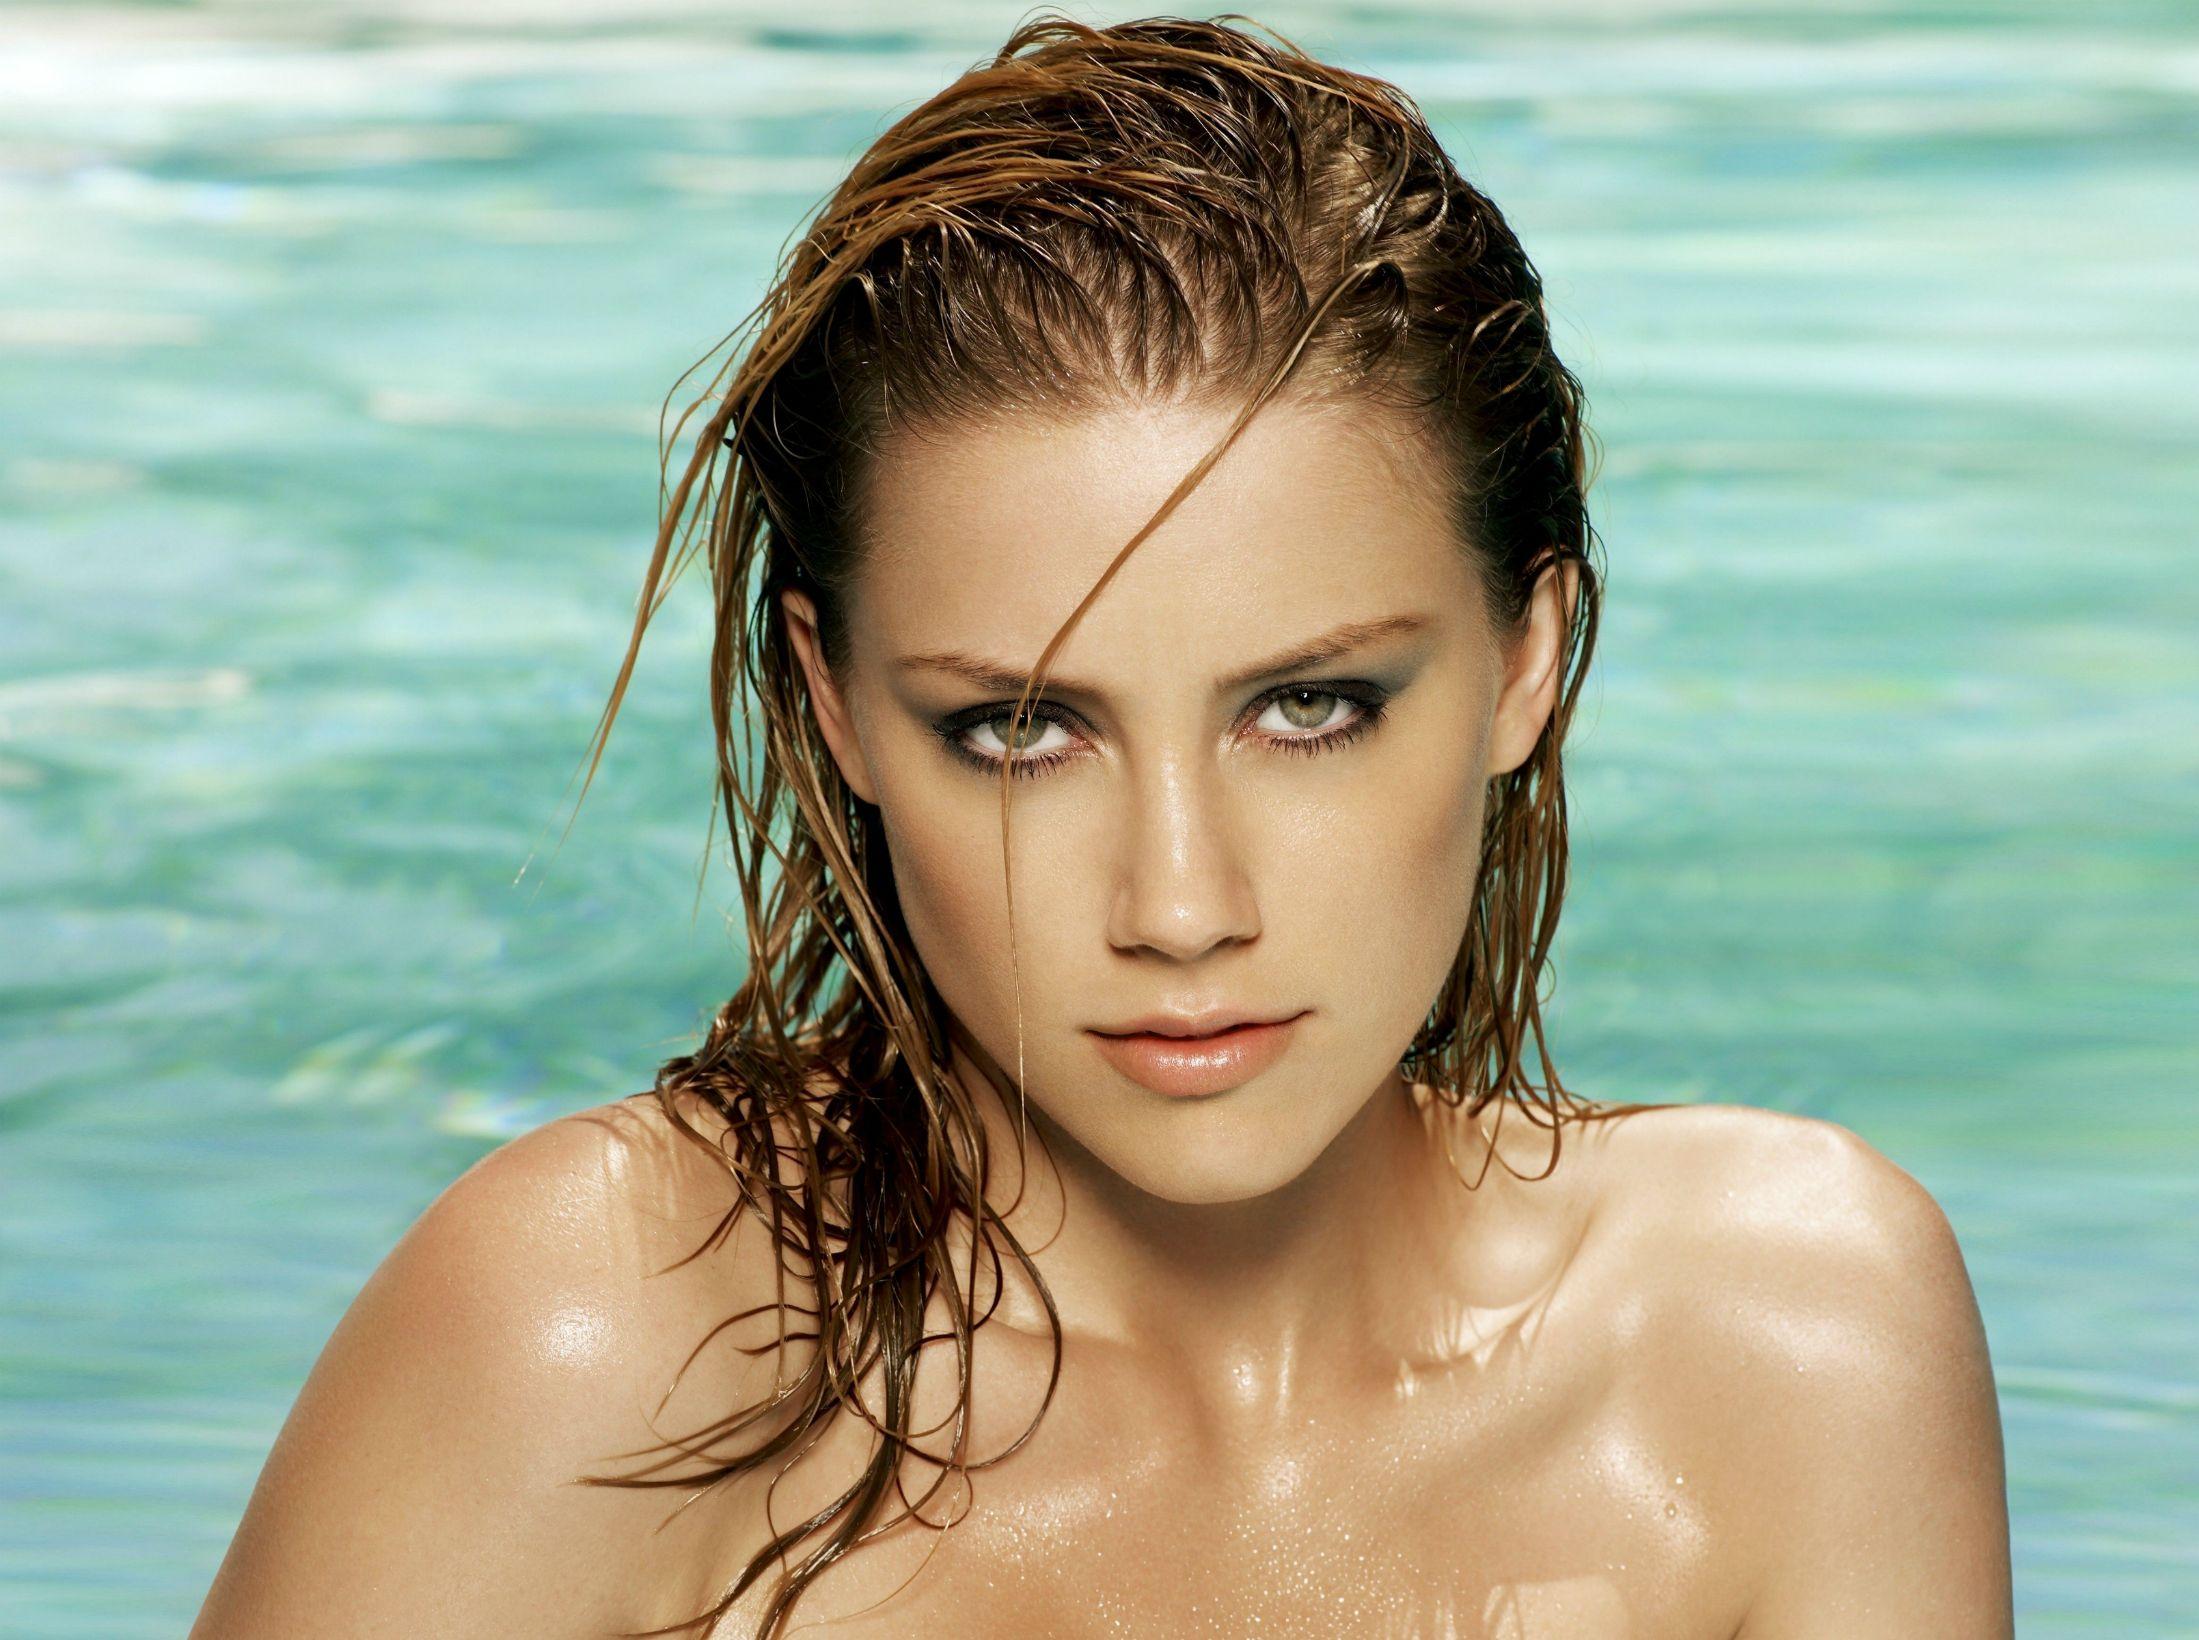 Amber Heard Leaked Nudes amber heard bikini pics in beach | amber heard bikini, amber